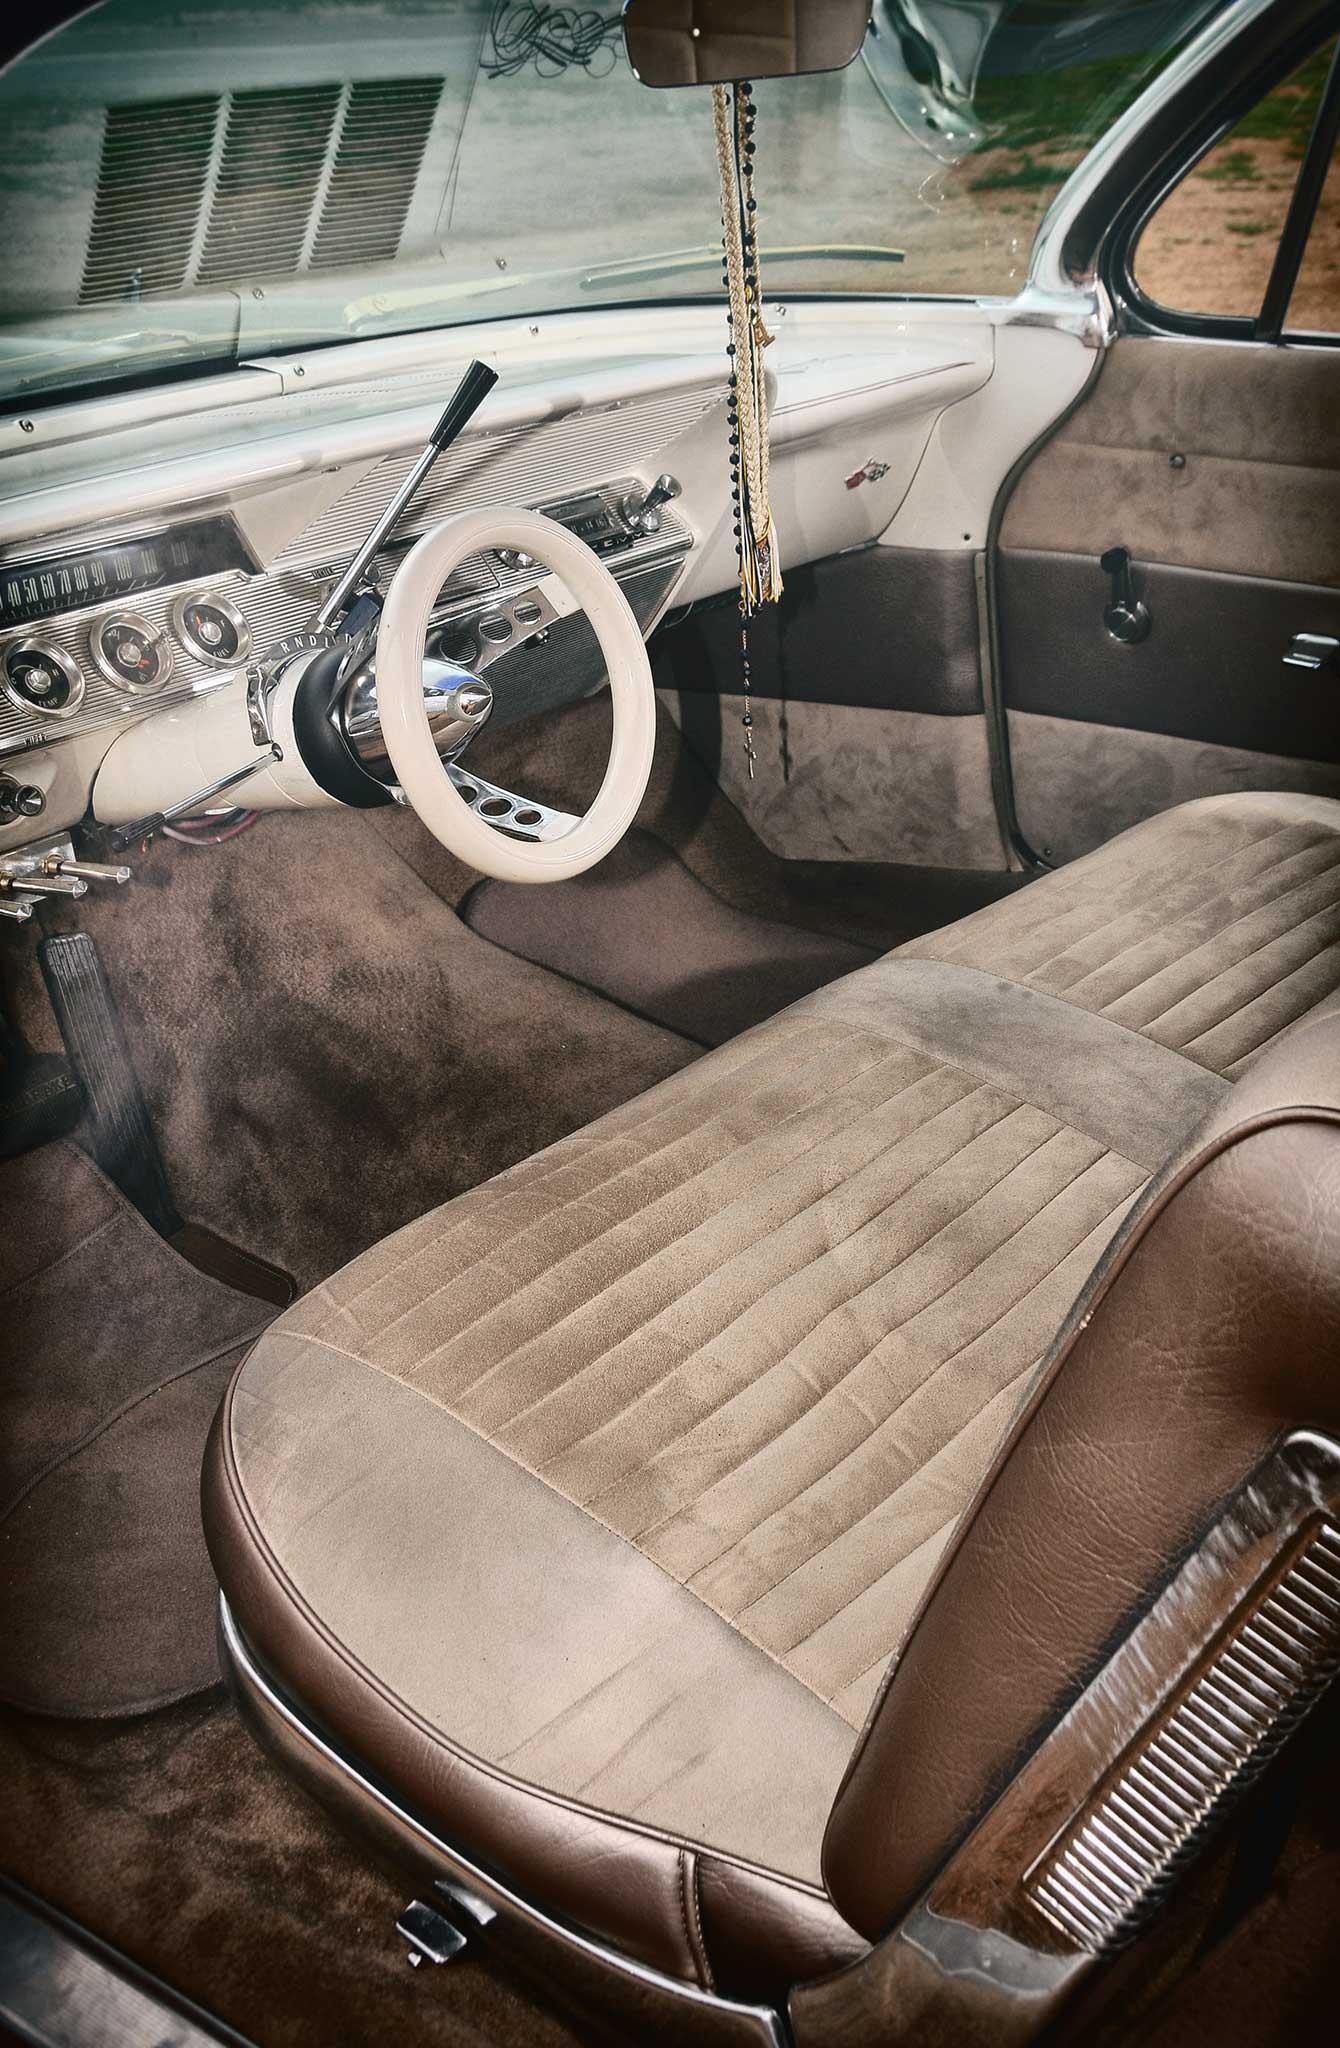 Dave White Chevy >> 1961 Chevrolet Impala - Precious Metals - Lowrider